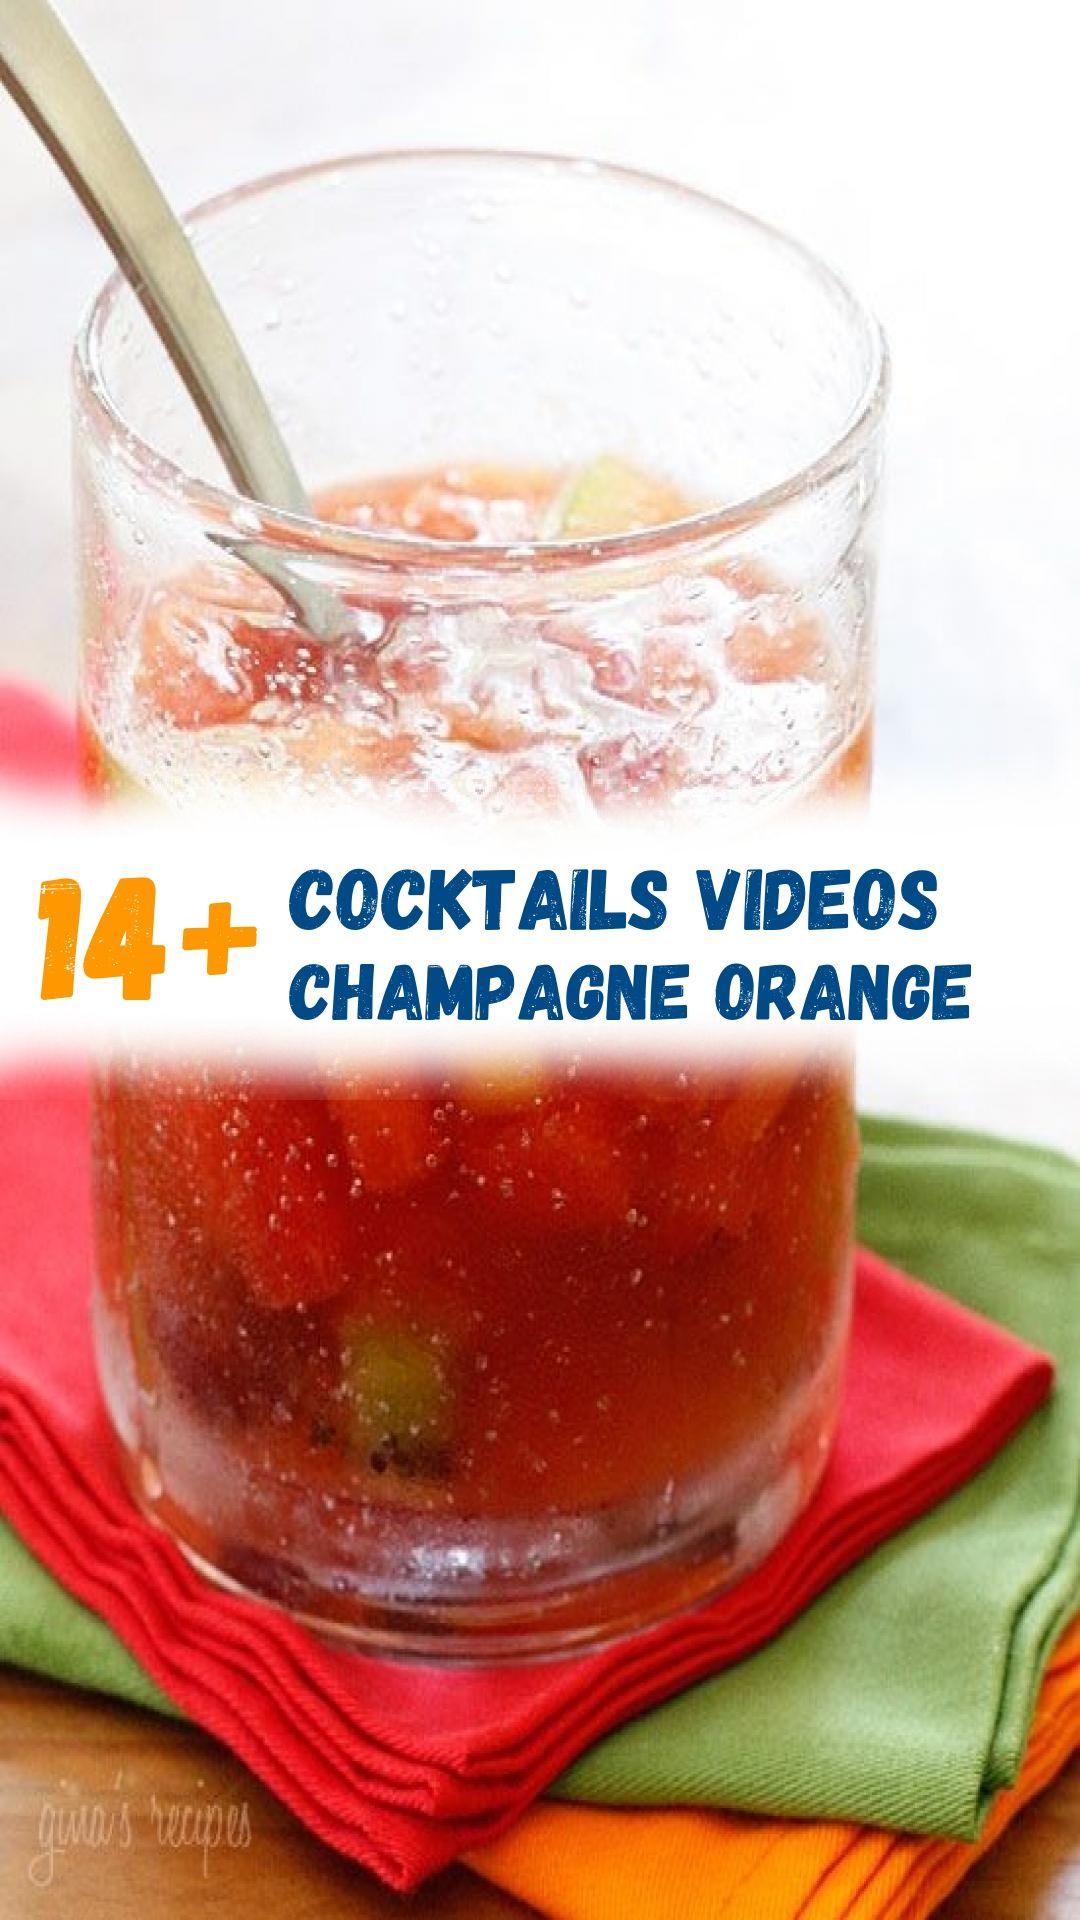 13 Cocktails Videos Champagne Orange In 2020 Cocktail Videos Cocktails Orange Cocktails